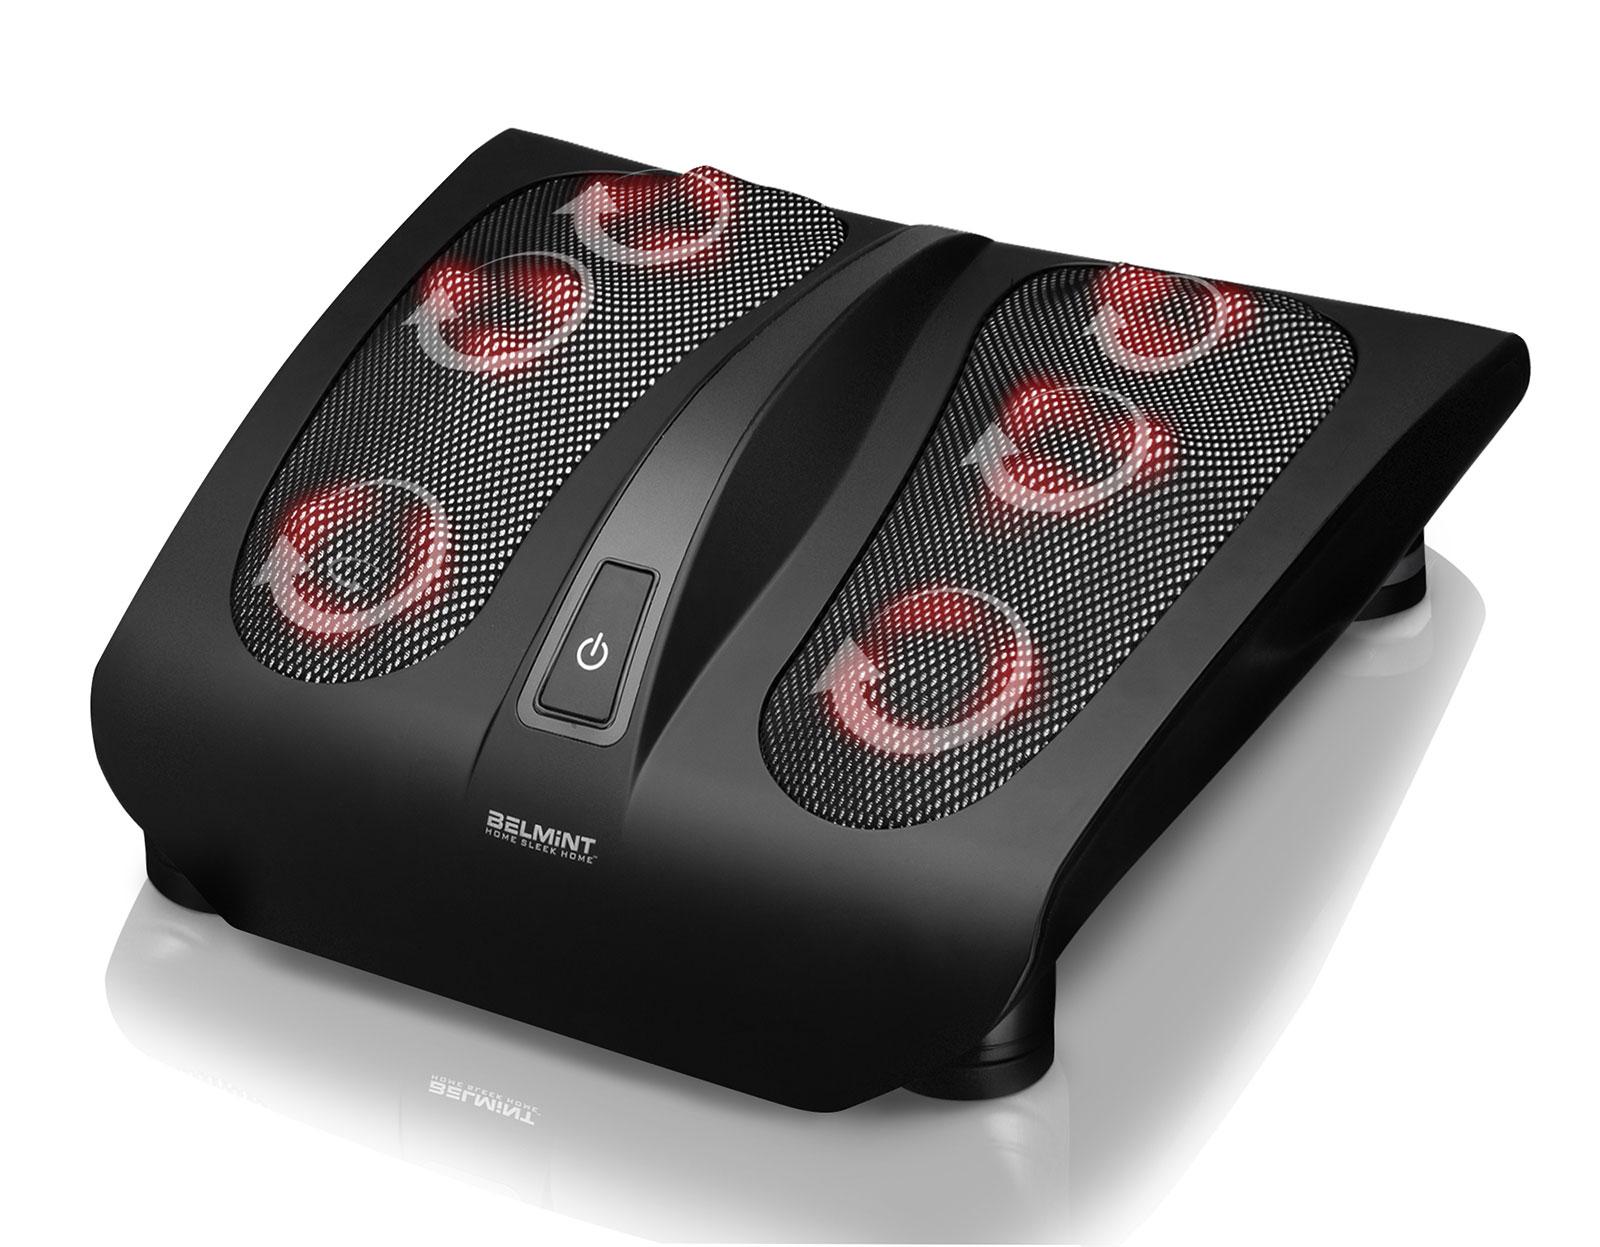 Belmint Shiatsu Foot Massager w/ Built-In Heat Function - Deep Kneading Therapy 0